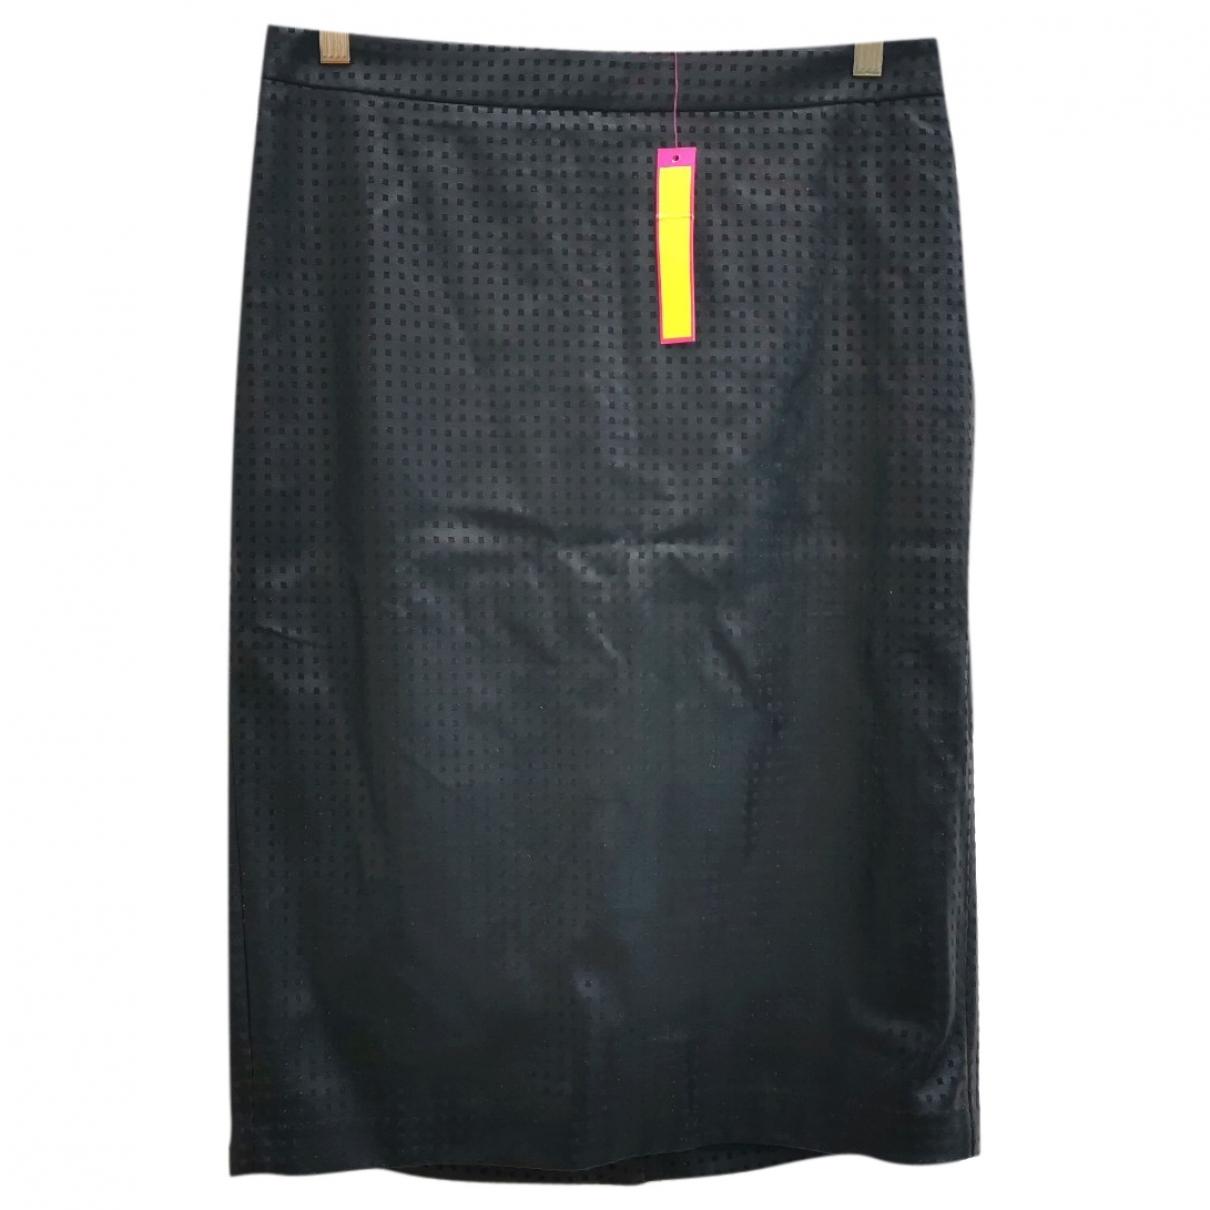 Catherine Catherine Malandrino \N Black skirt for Women 10 US